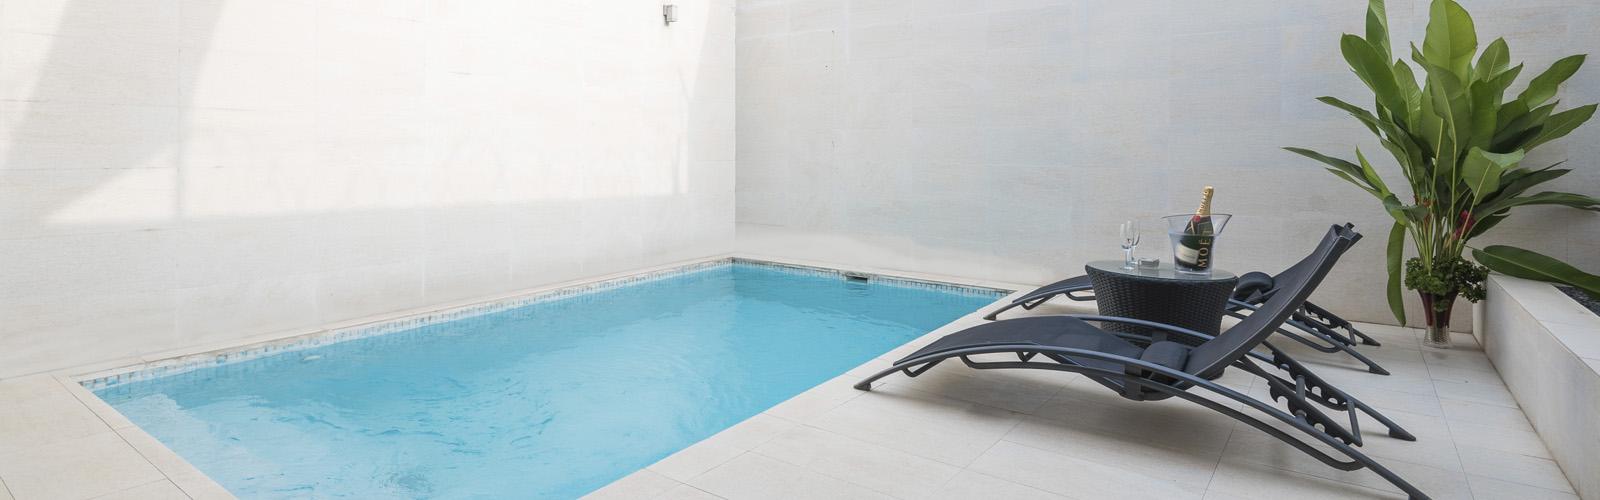 slider-piscina-magno-suites-malabo